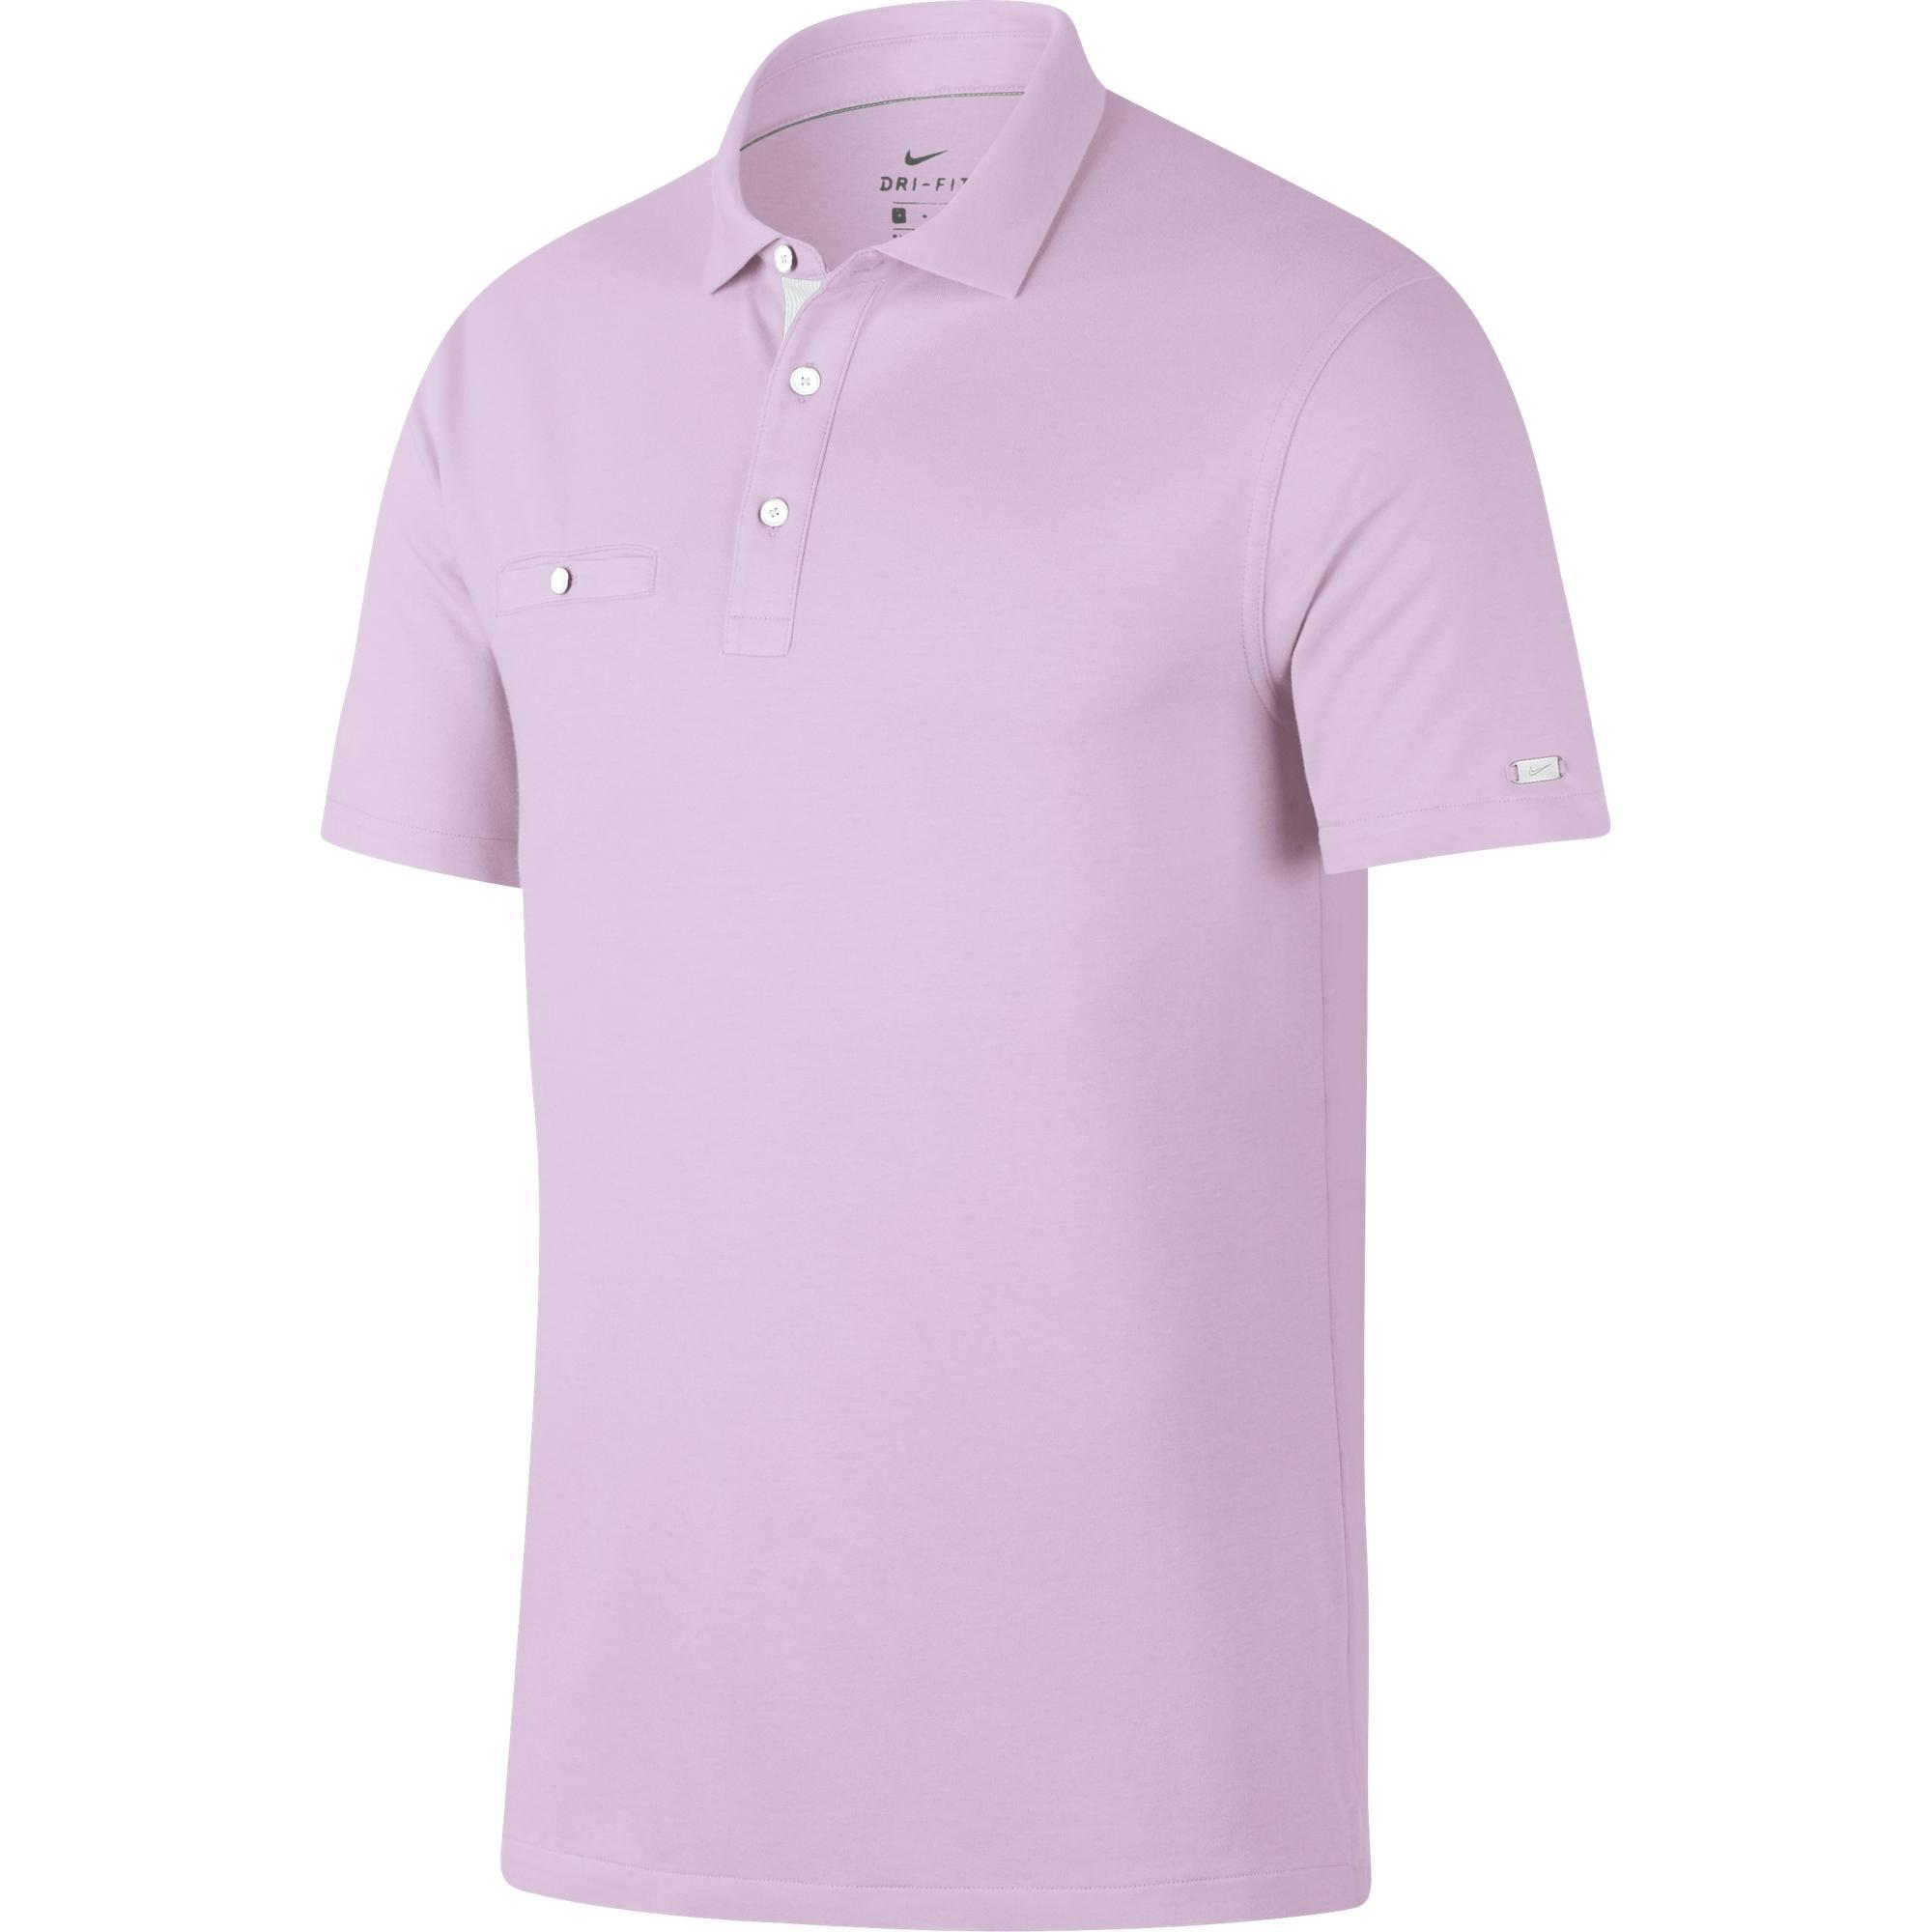 Men's Dri-FIT Player Solid Short Sleeve Shirt